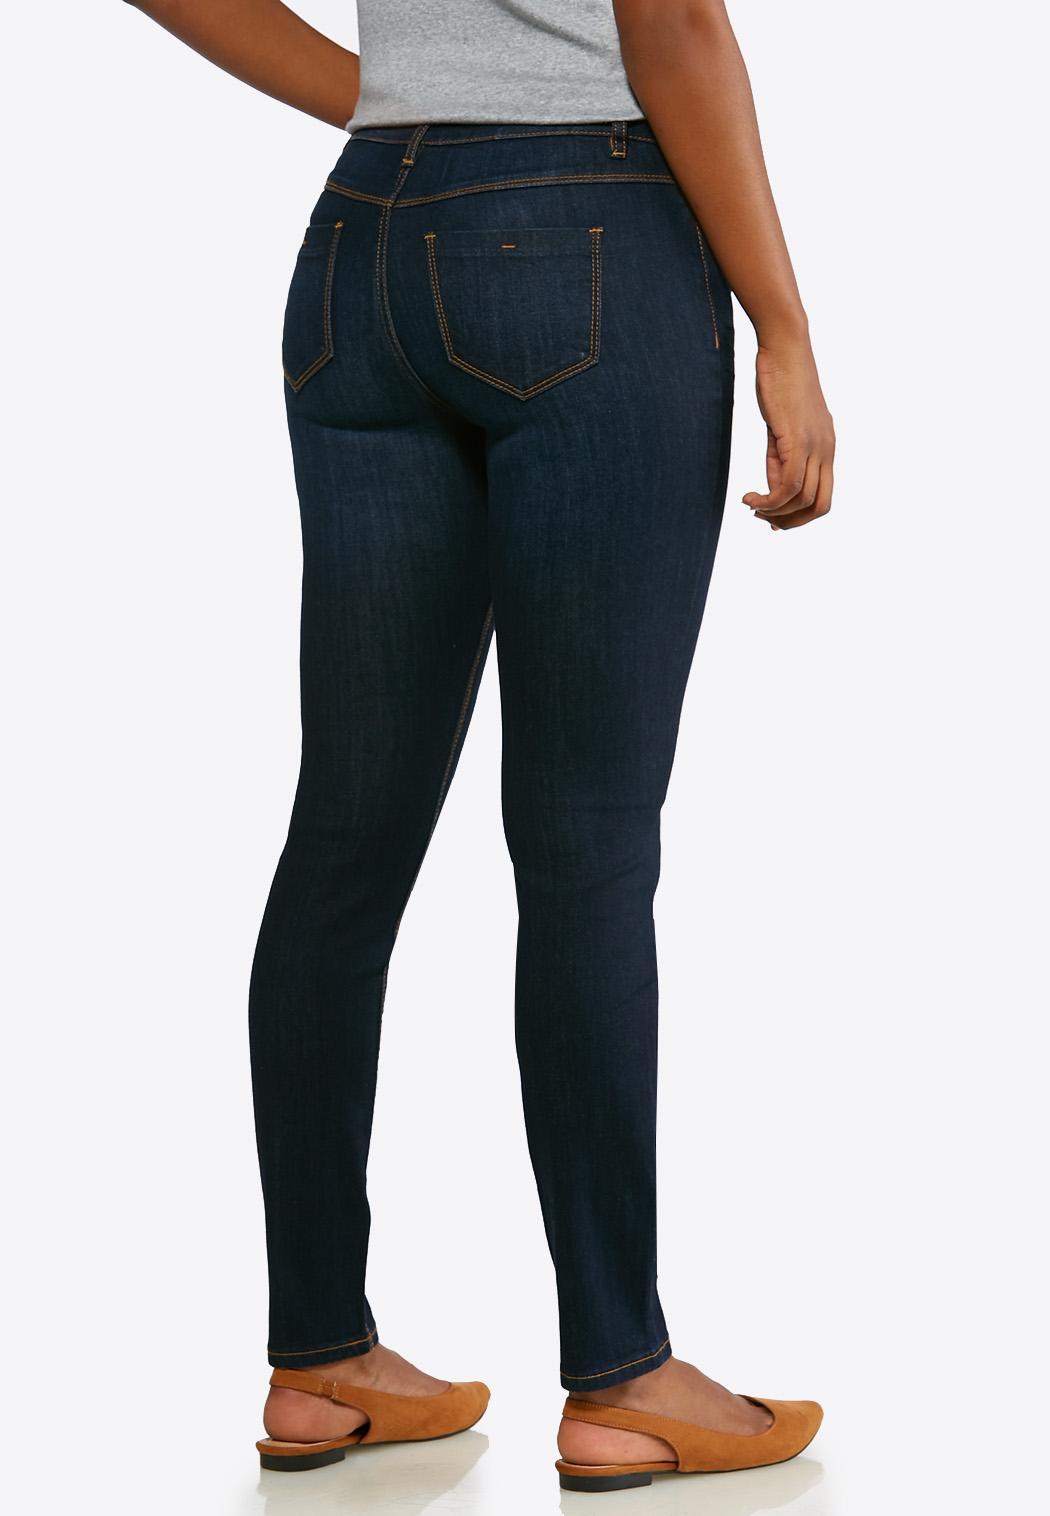 Petite Dark Denim Jeans (Item #43664795)